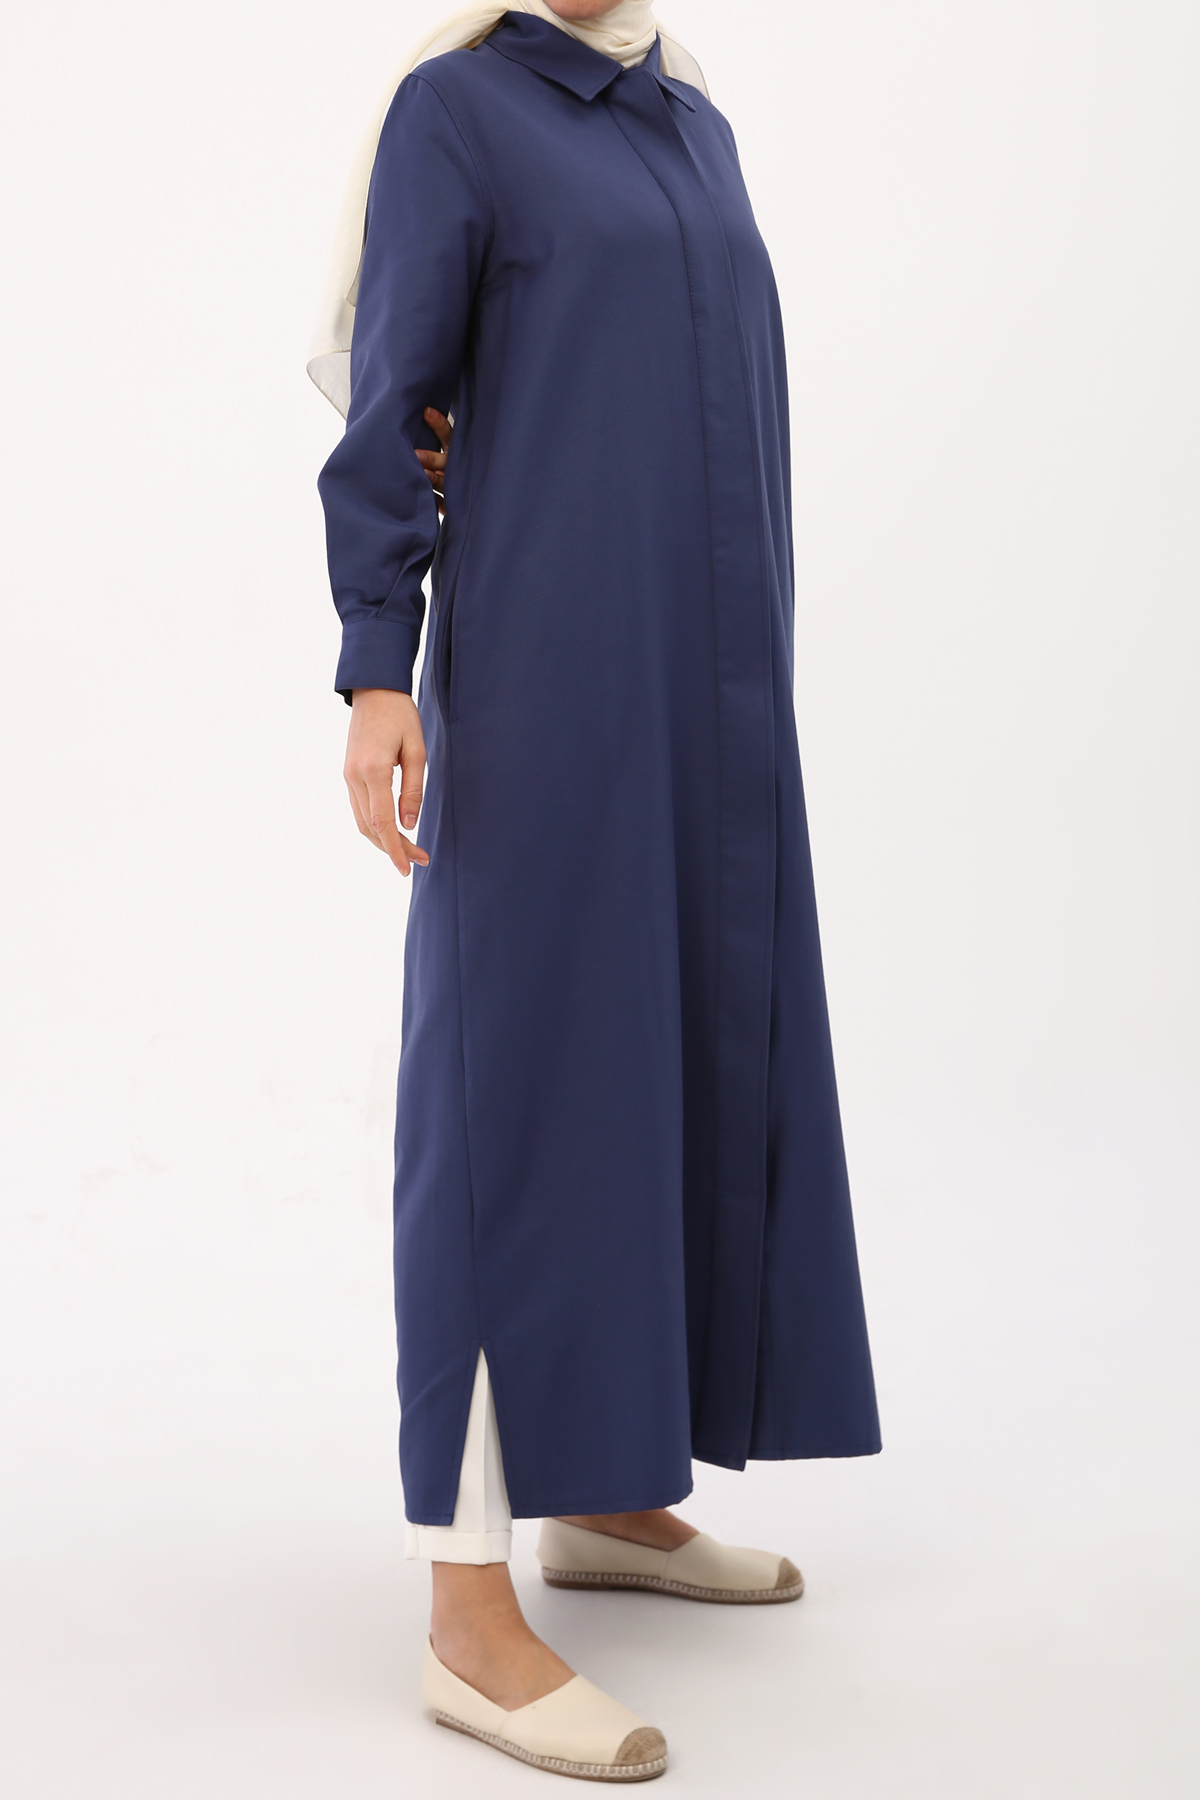 Women's Pocket Indigo Abaya